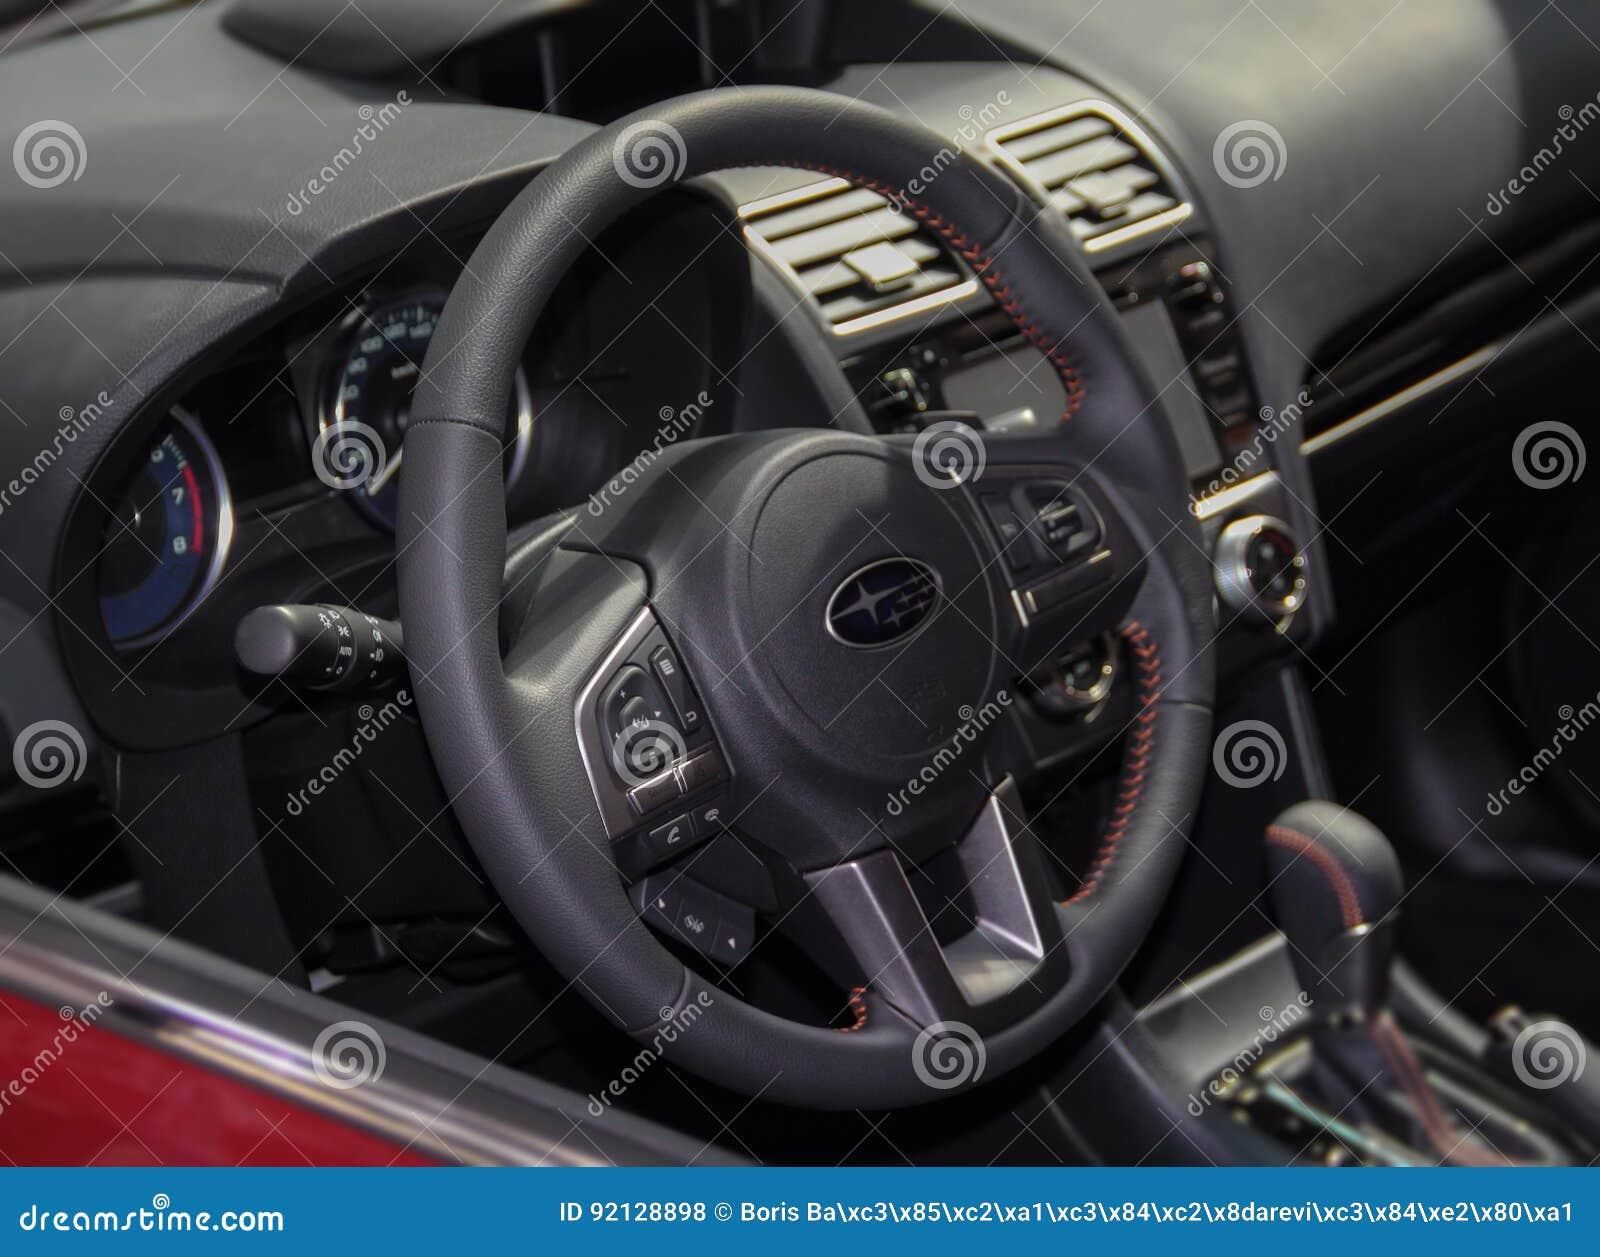 Serbia; Belgrade; April 2, 2017; The close up of Subaru steering